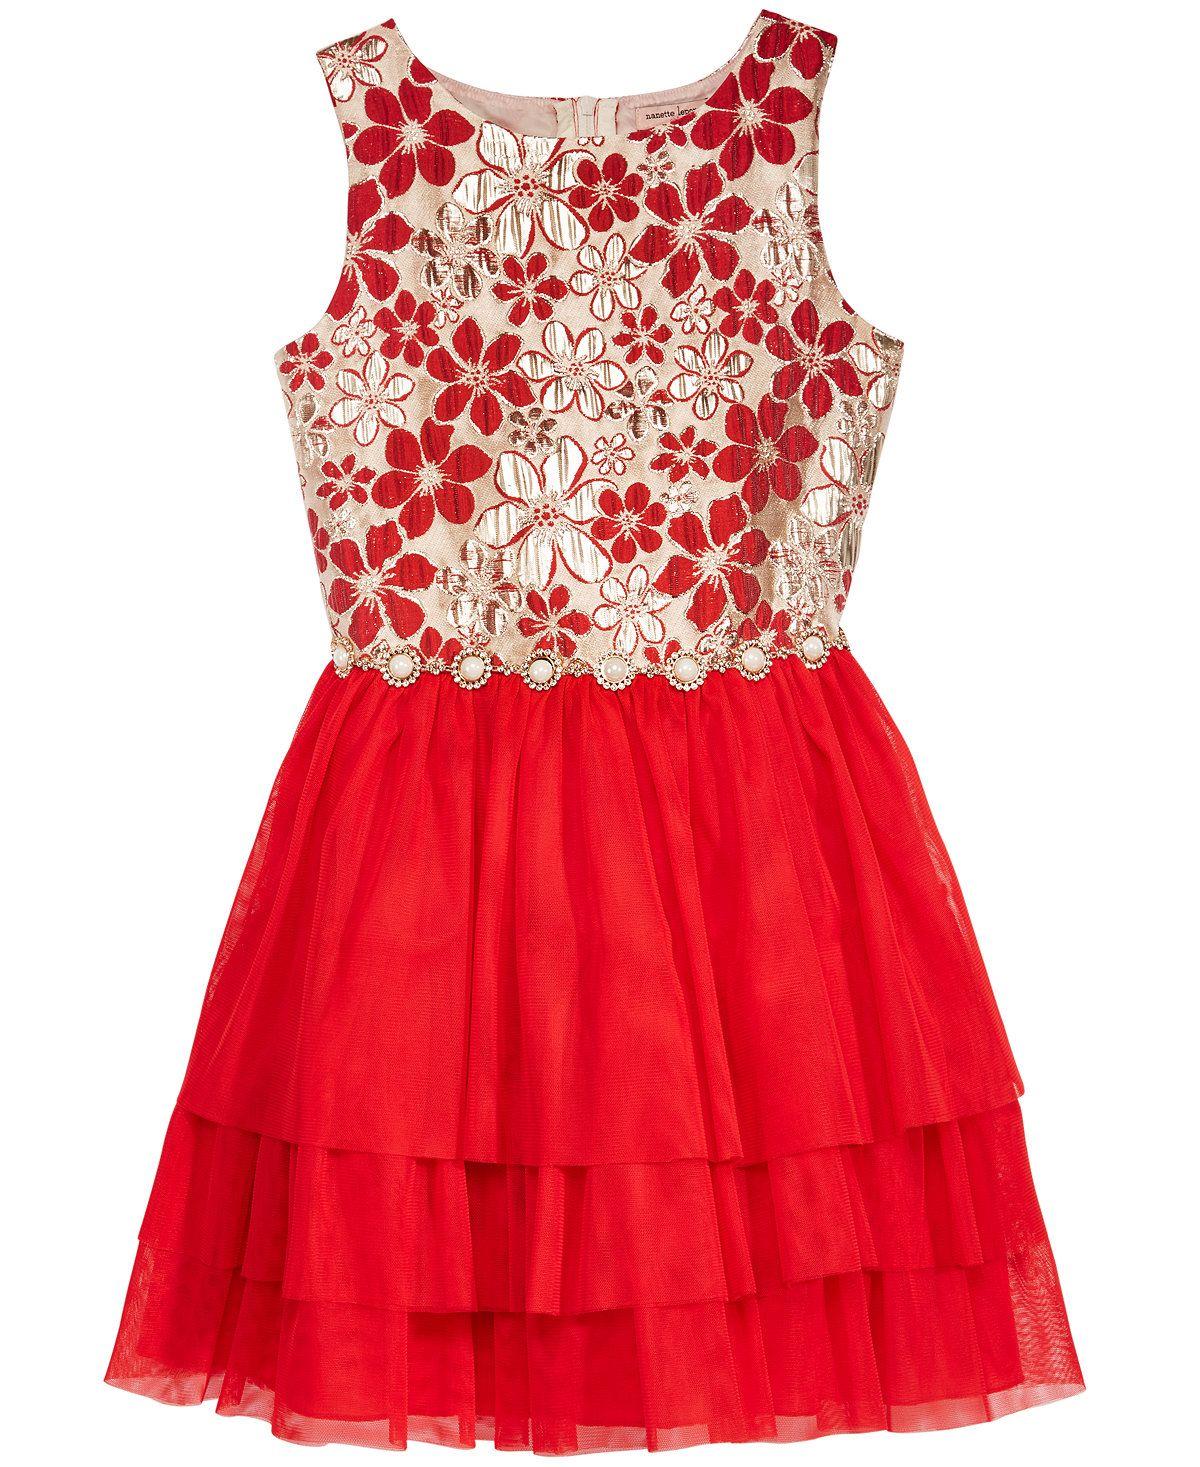 45791c38b8 Nanette Lepore Brocade Bodice Dress